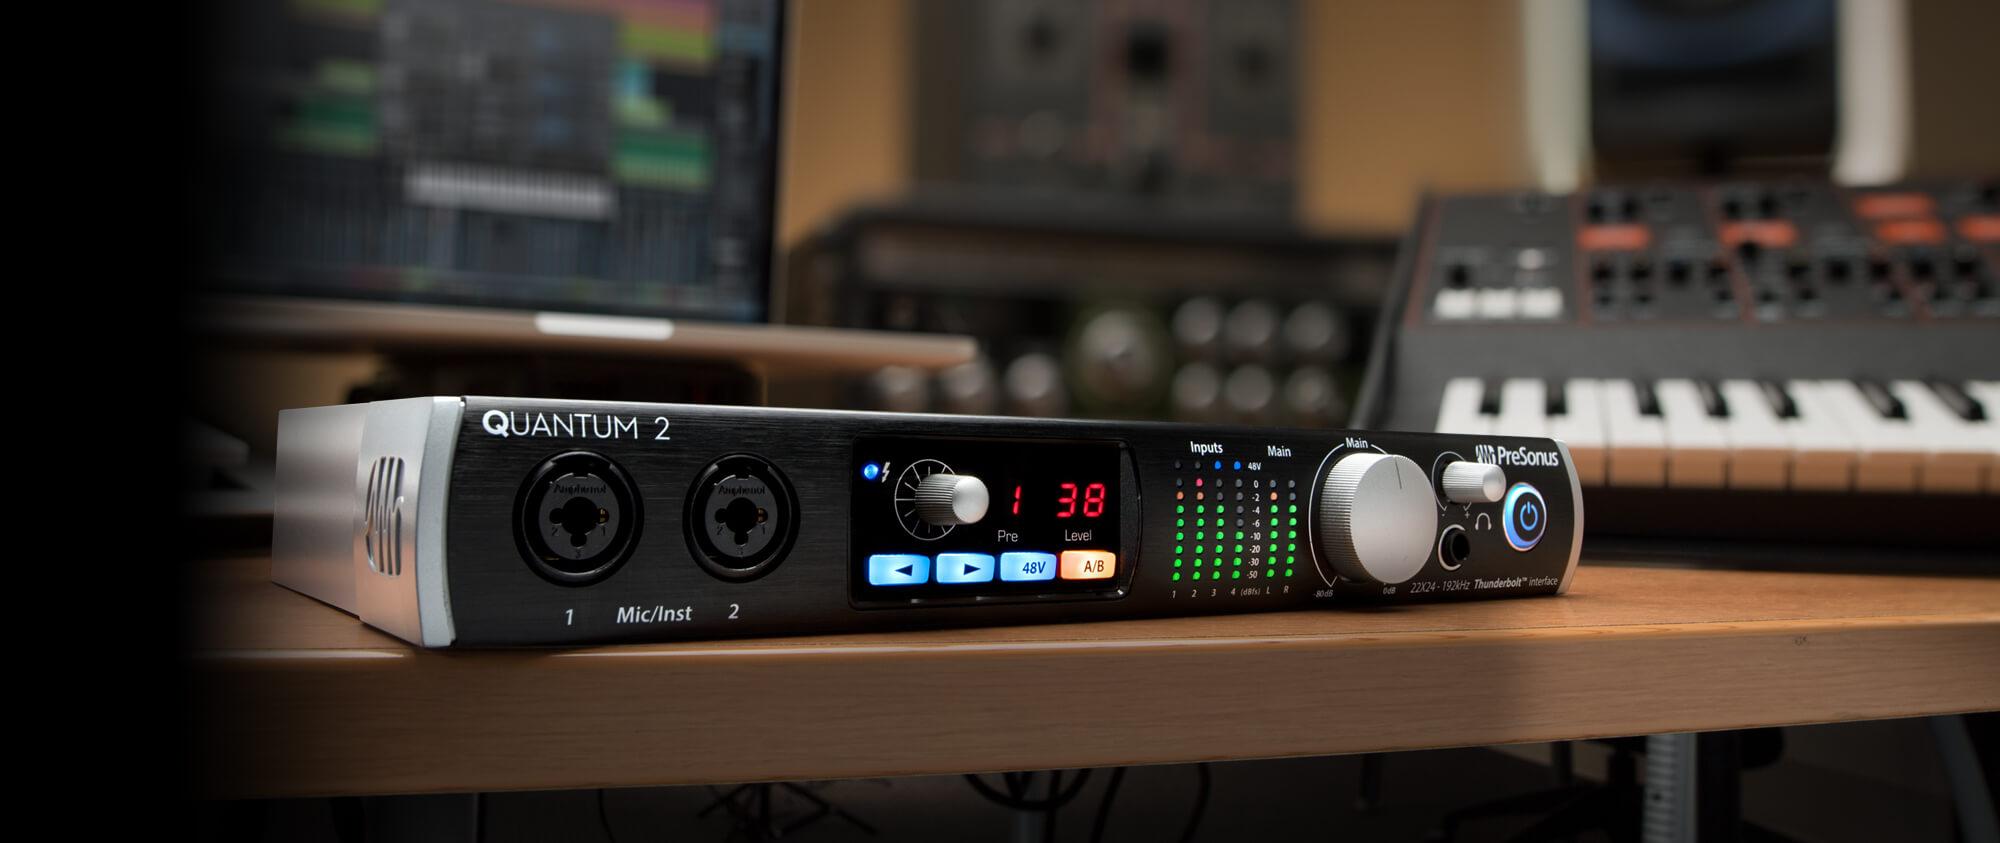 Pro Audio Equipment Fast Deliver Presonus Quantum 26x32 Thunderbolt 2 Audio Interface New Jrr Shop